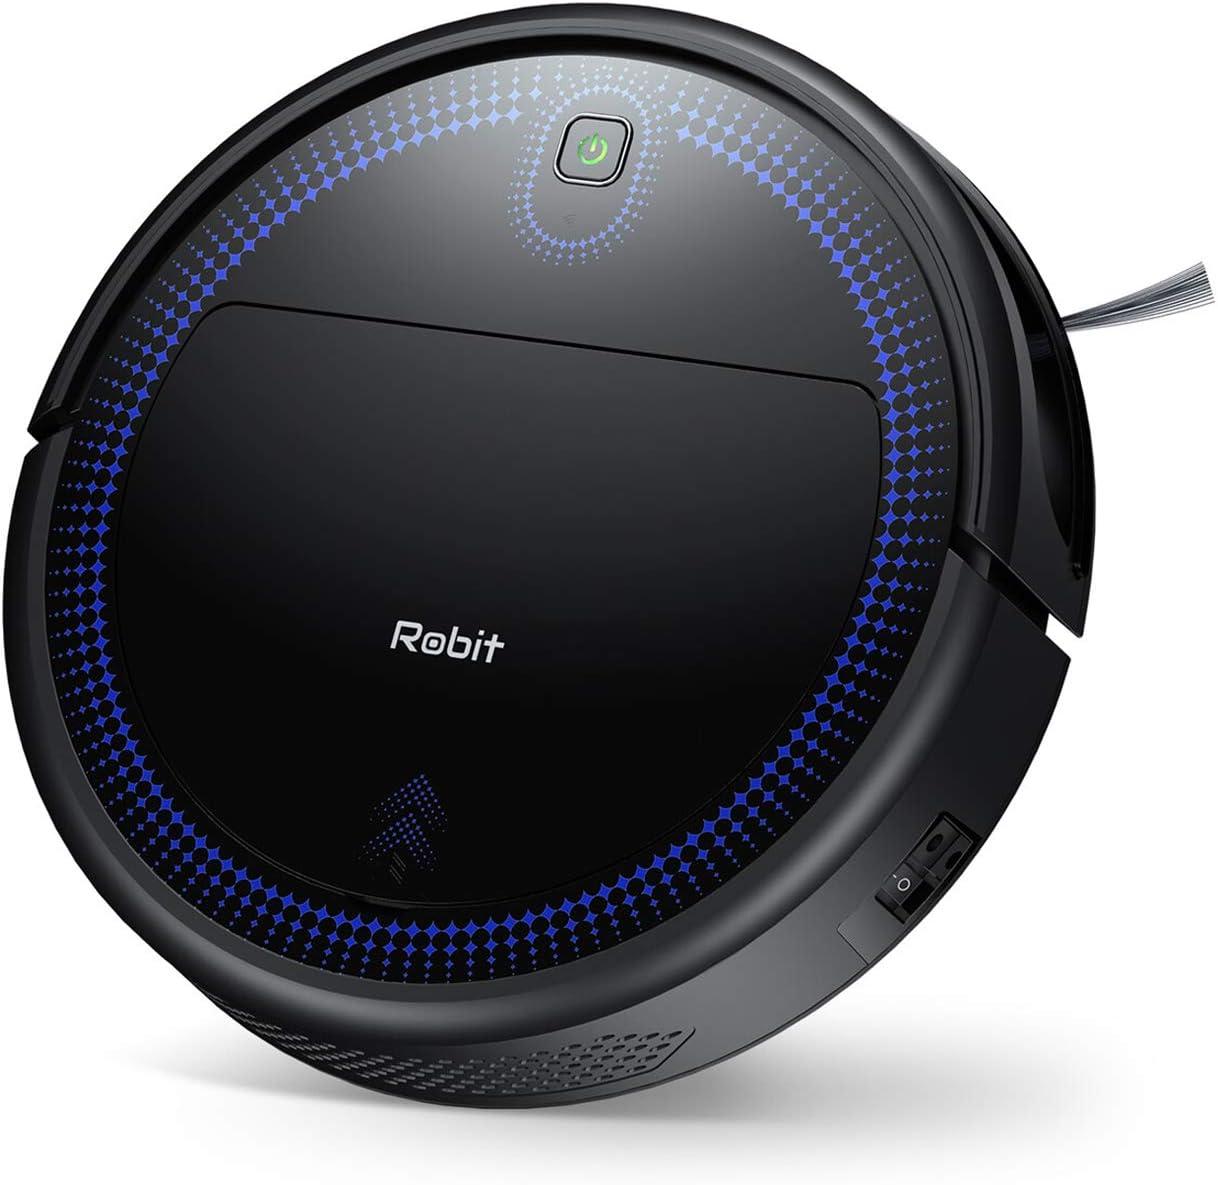 Robot Vacuum Cleaner, Robit 2000Pa (Slim) Super High Sunction & Self Charging Robotic Vacuum Cleaners, Cleans Pet Hair, Hard Floors, Carpet